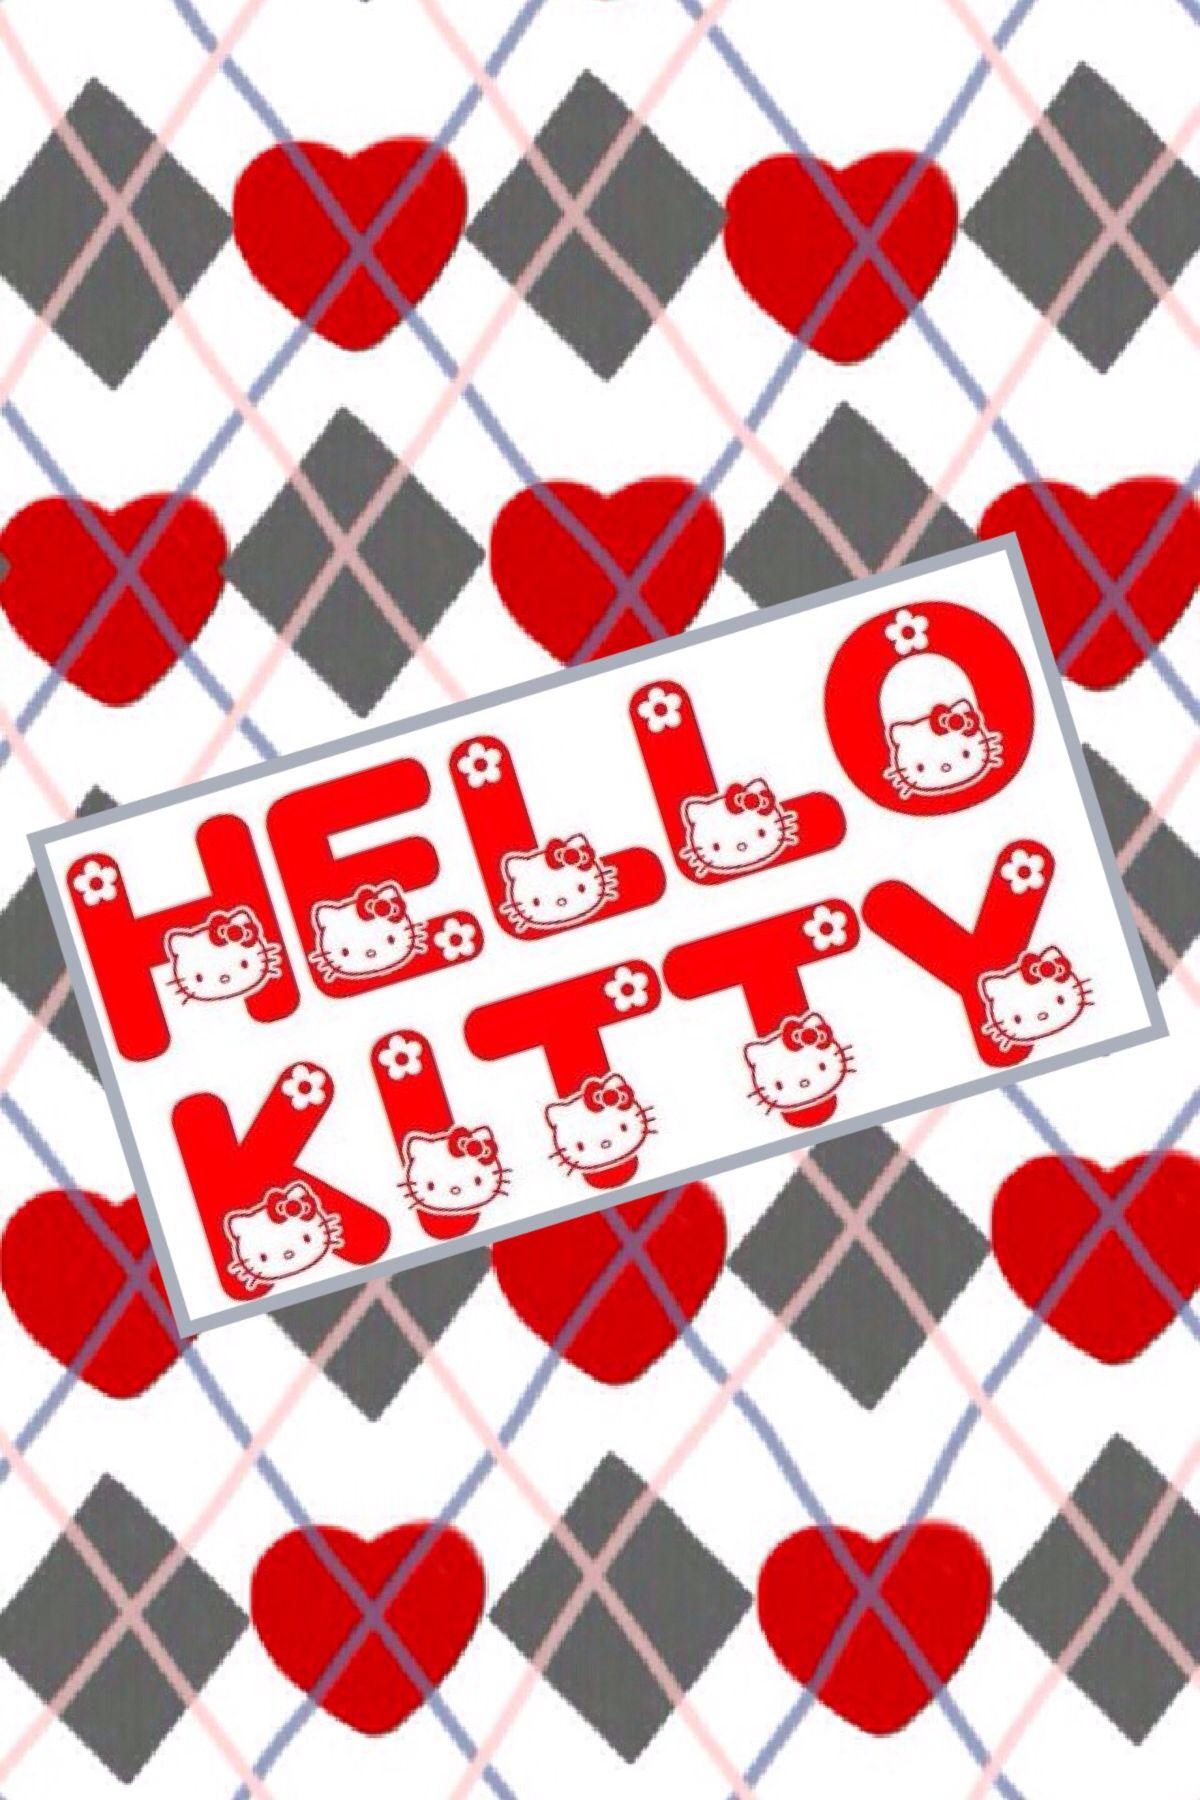 Fantastic Wallpaper Hello Kitty Heart - d78151a2895ba791a7a884b6704356bf  Photograph_475872.jpg